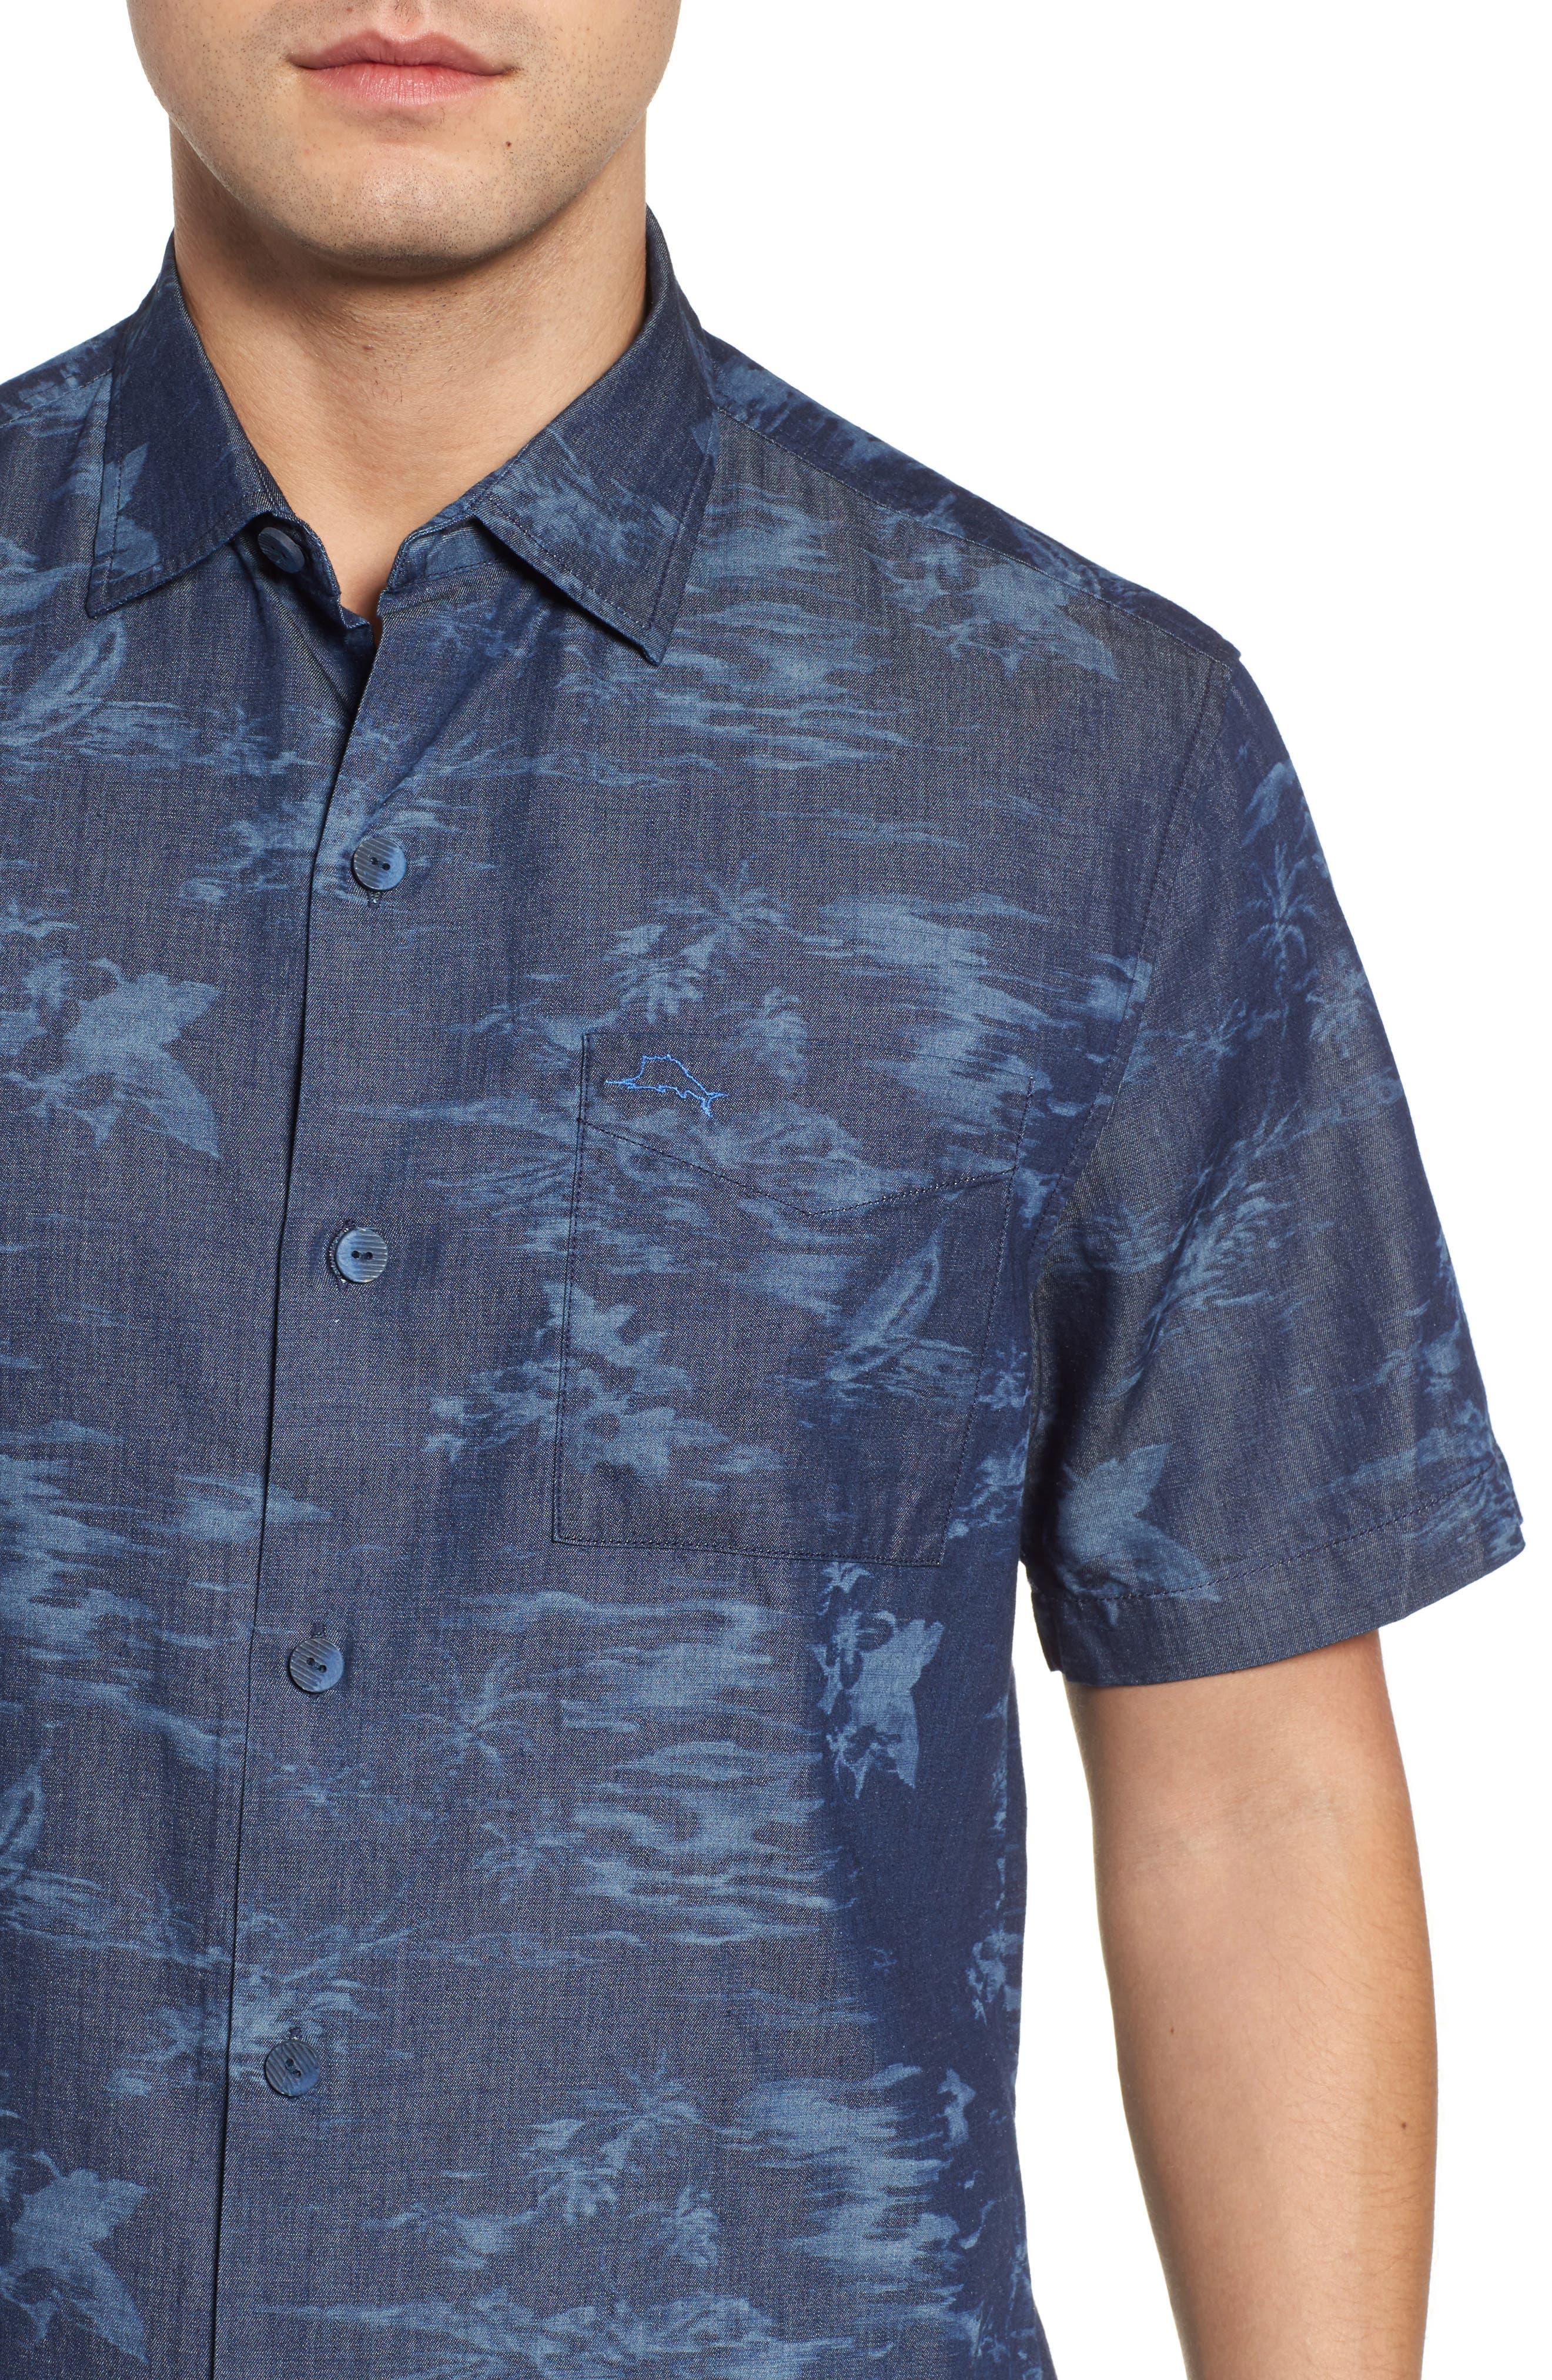 South Beach Scenic Cotton & Silk Camp Shirt,                             Alternate thumbnail 4, color,                             Indigo